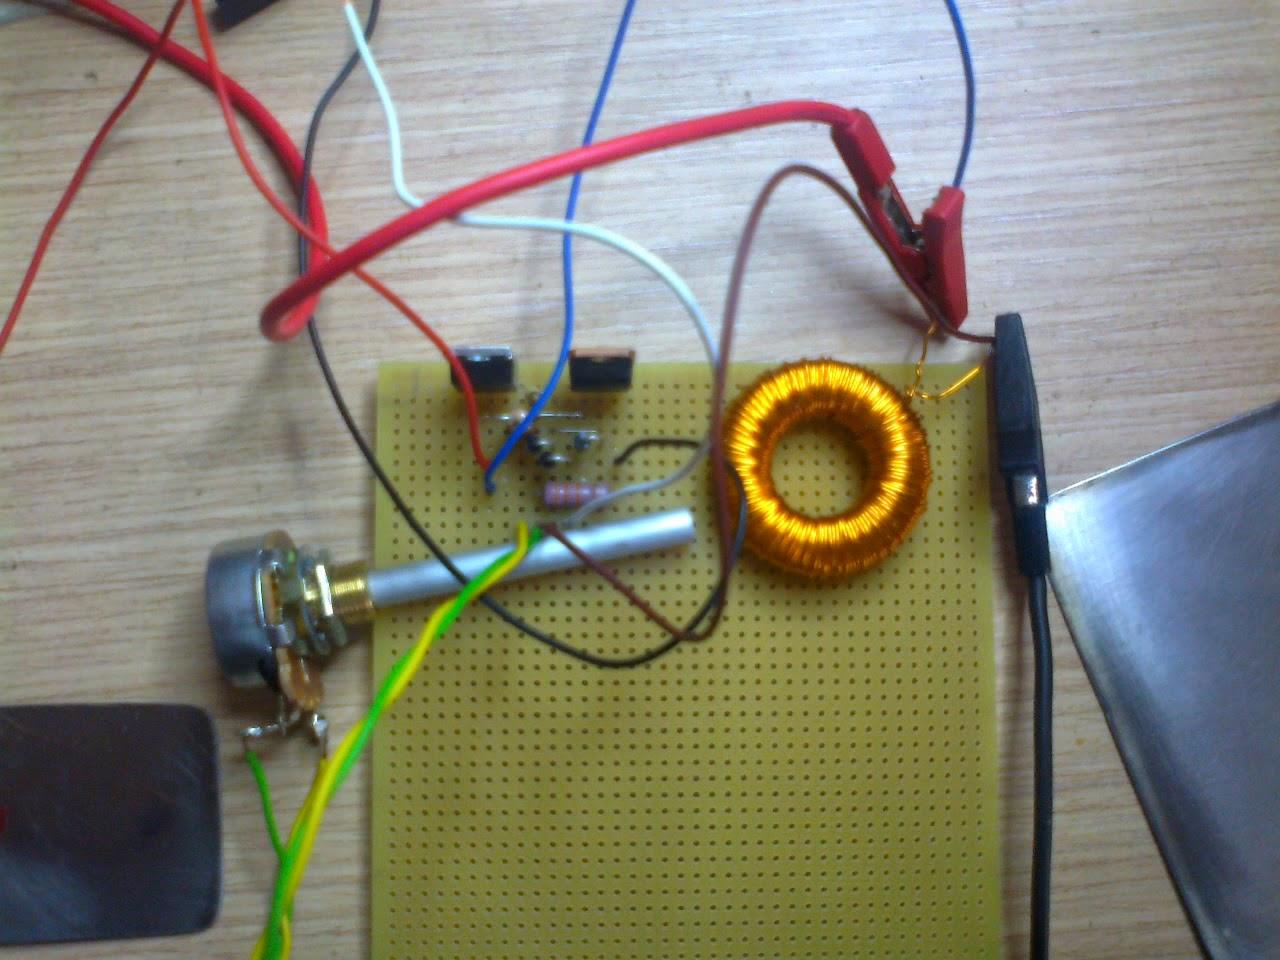 Main Electrical Panel Wiring Diagram Http Wwwsentexnet Mec1995